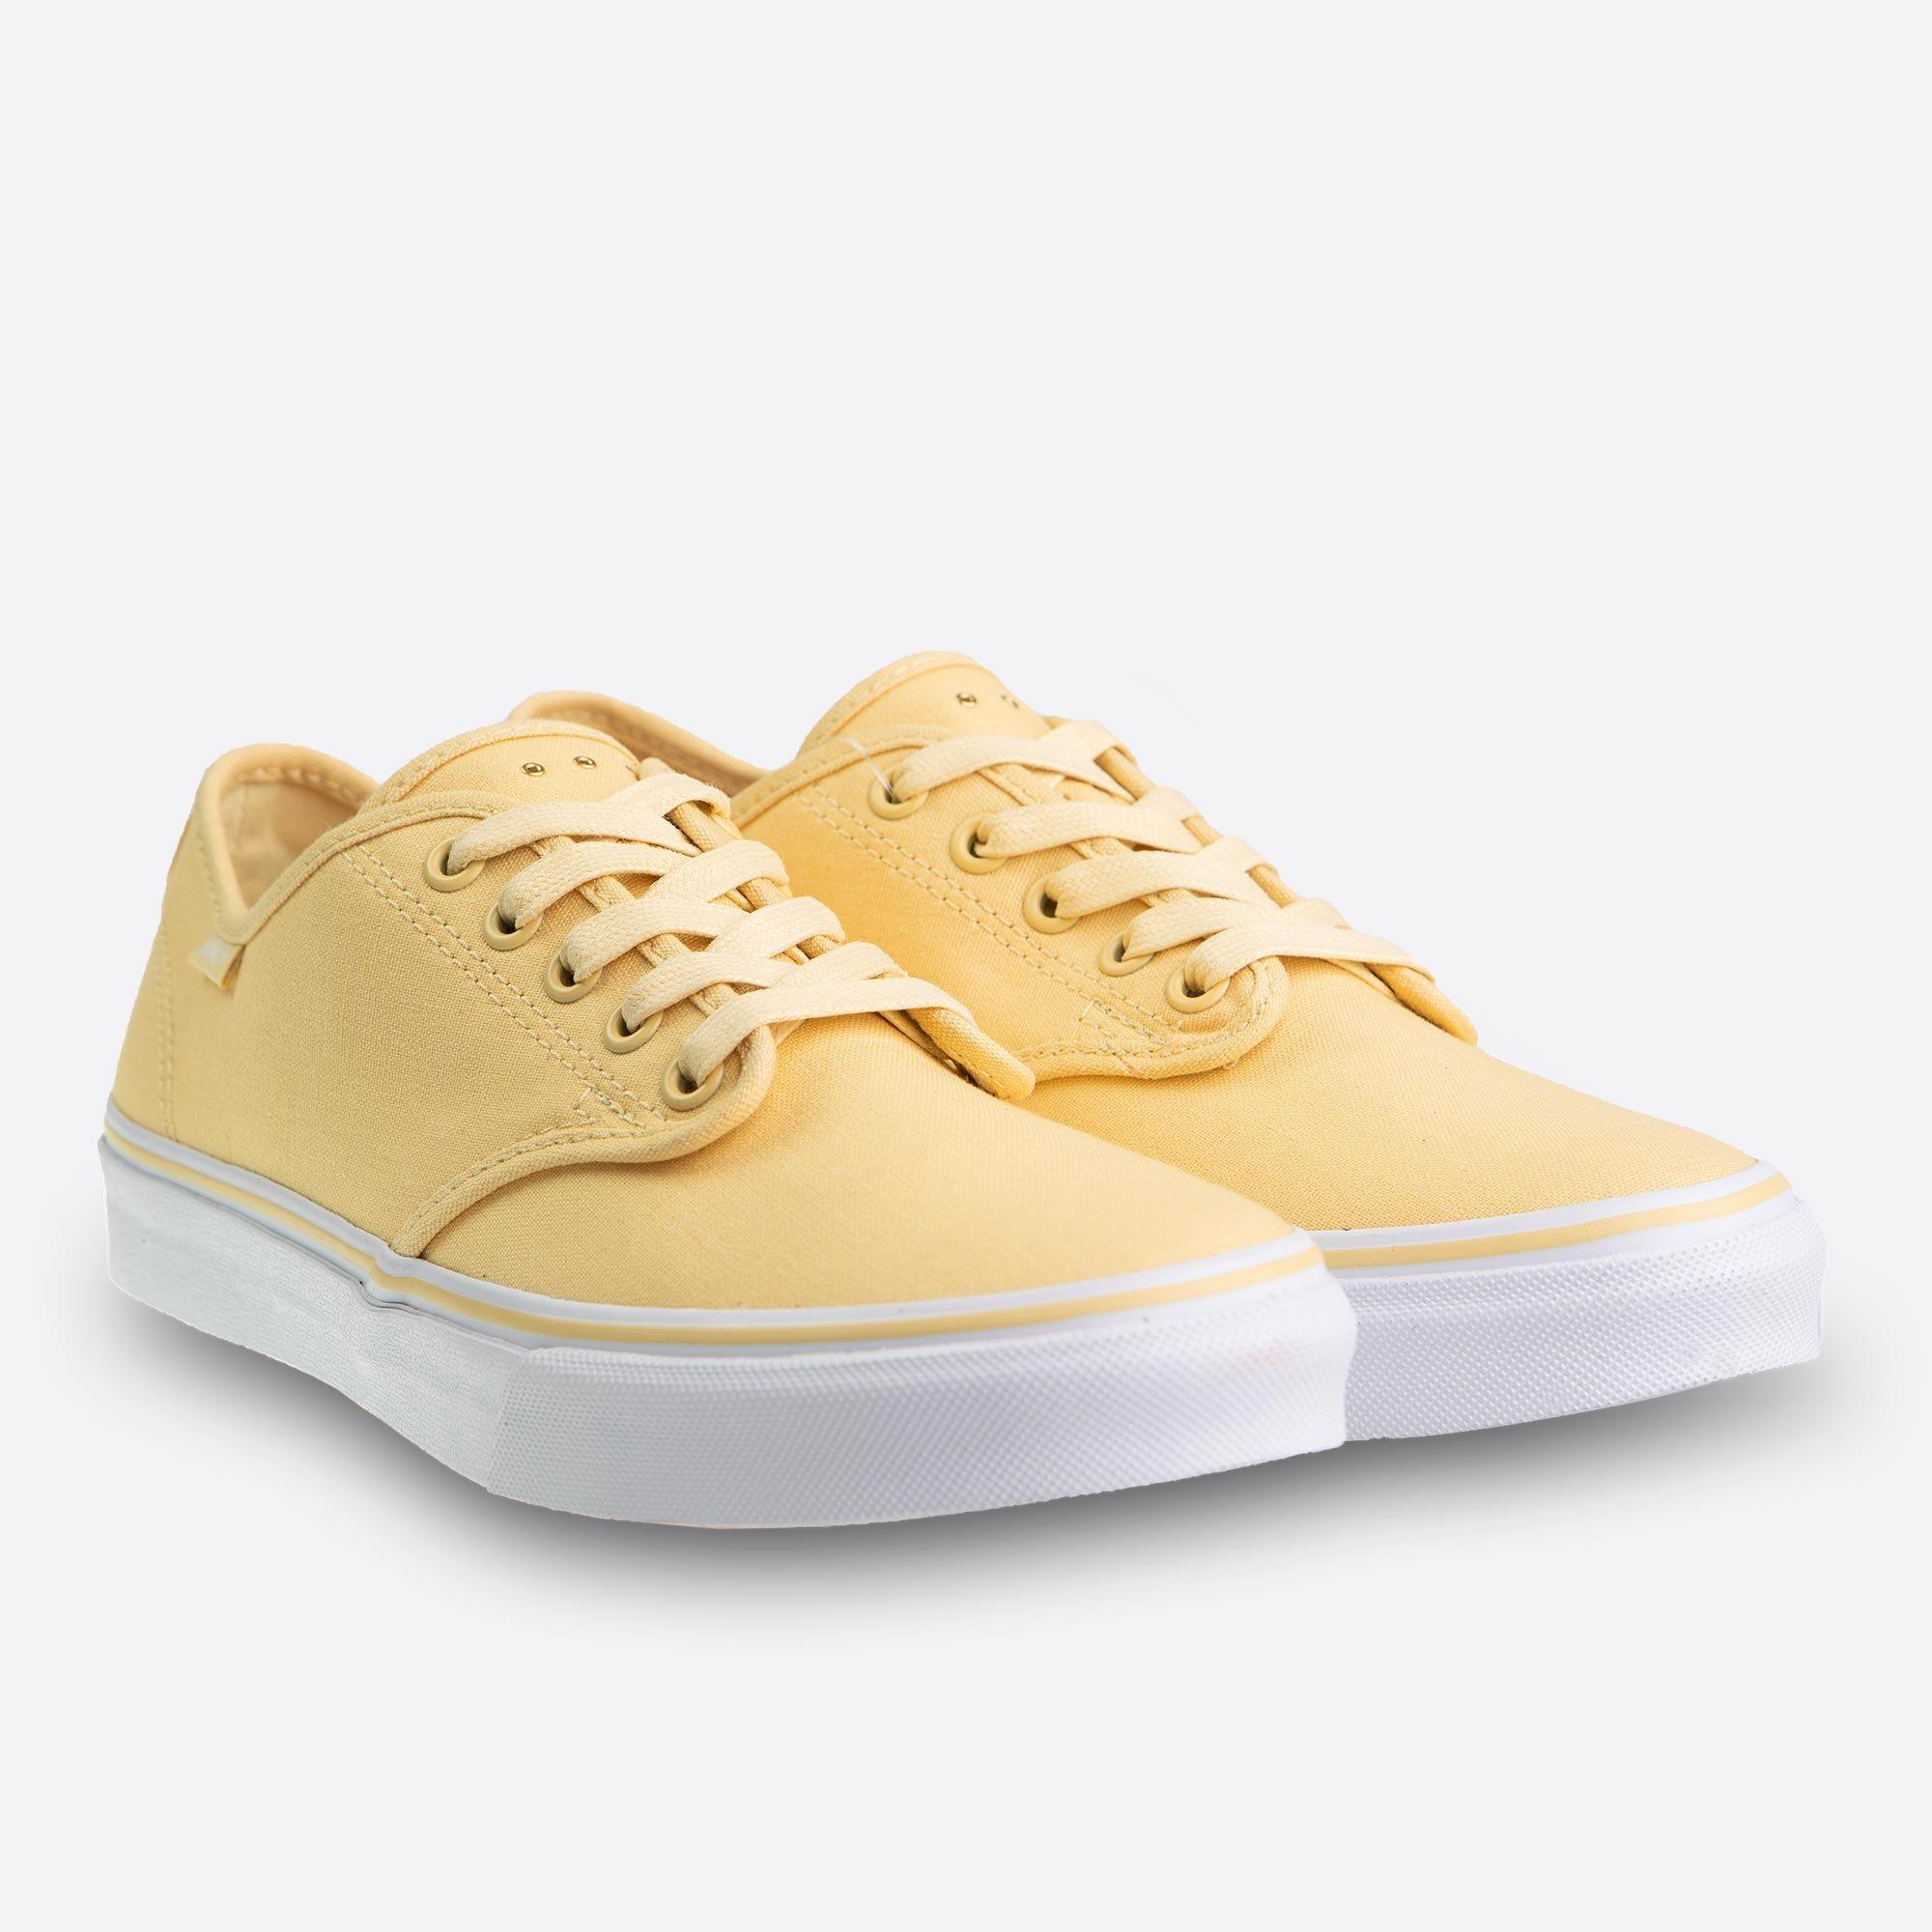 392979cade Dámske žlté tenisky Vans Camden Stripe Micro Eyelets Pineapple Slice